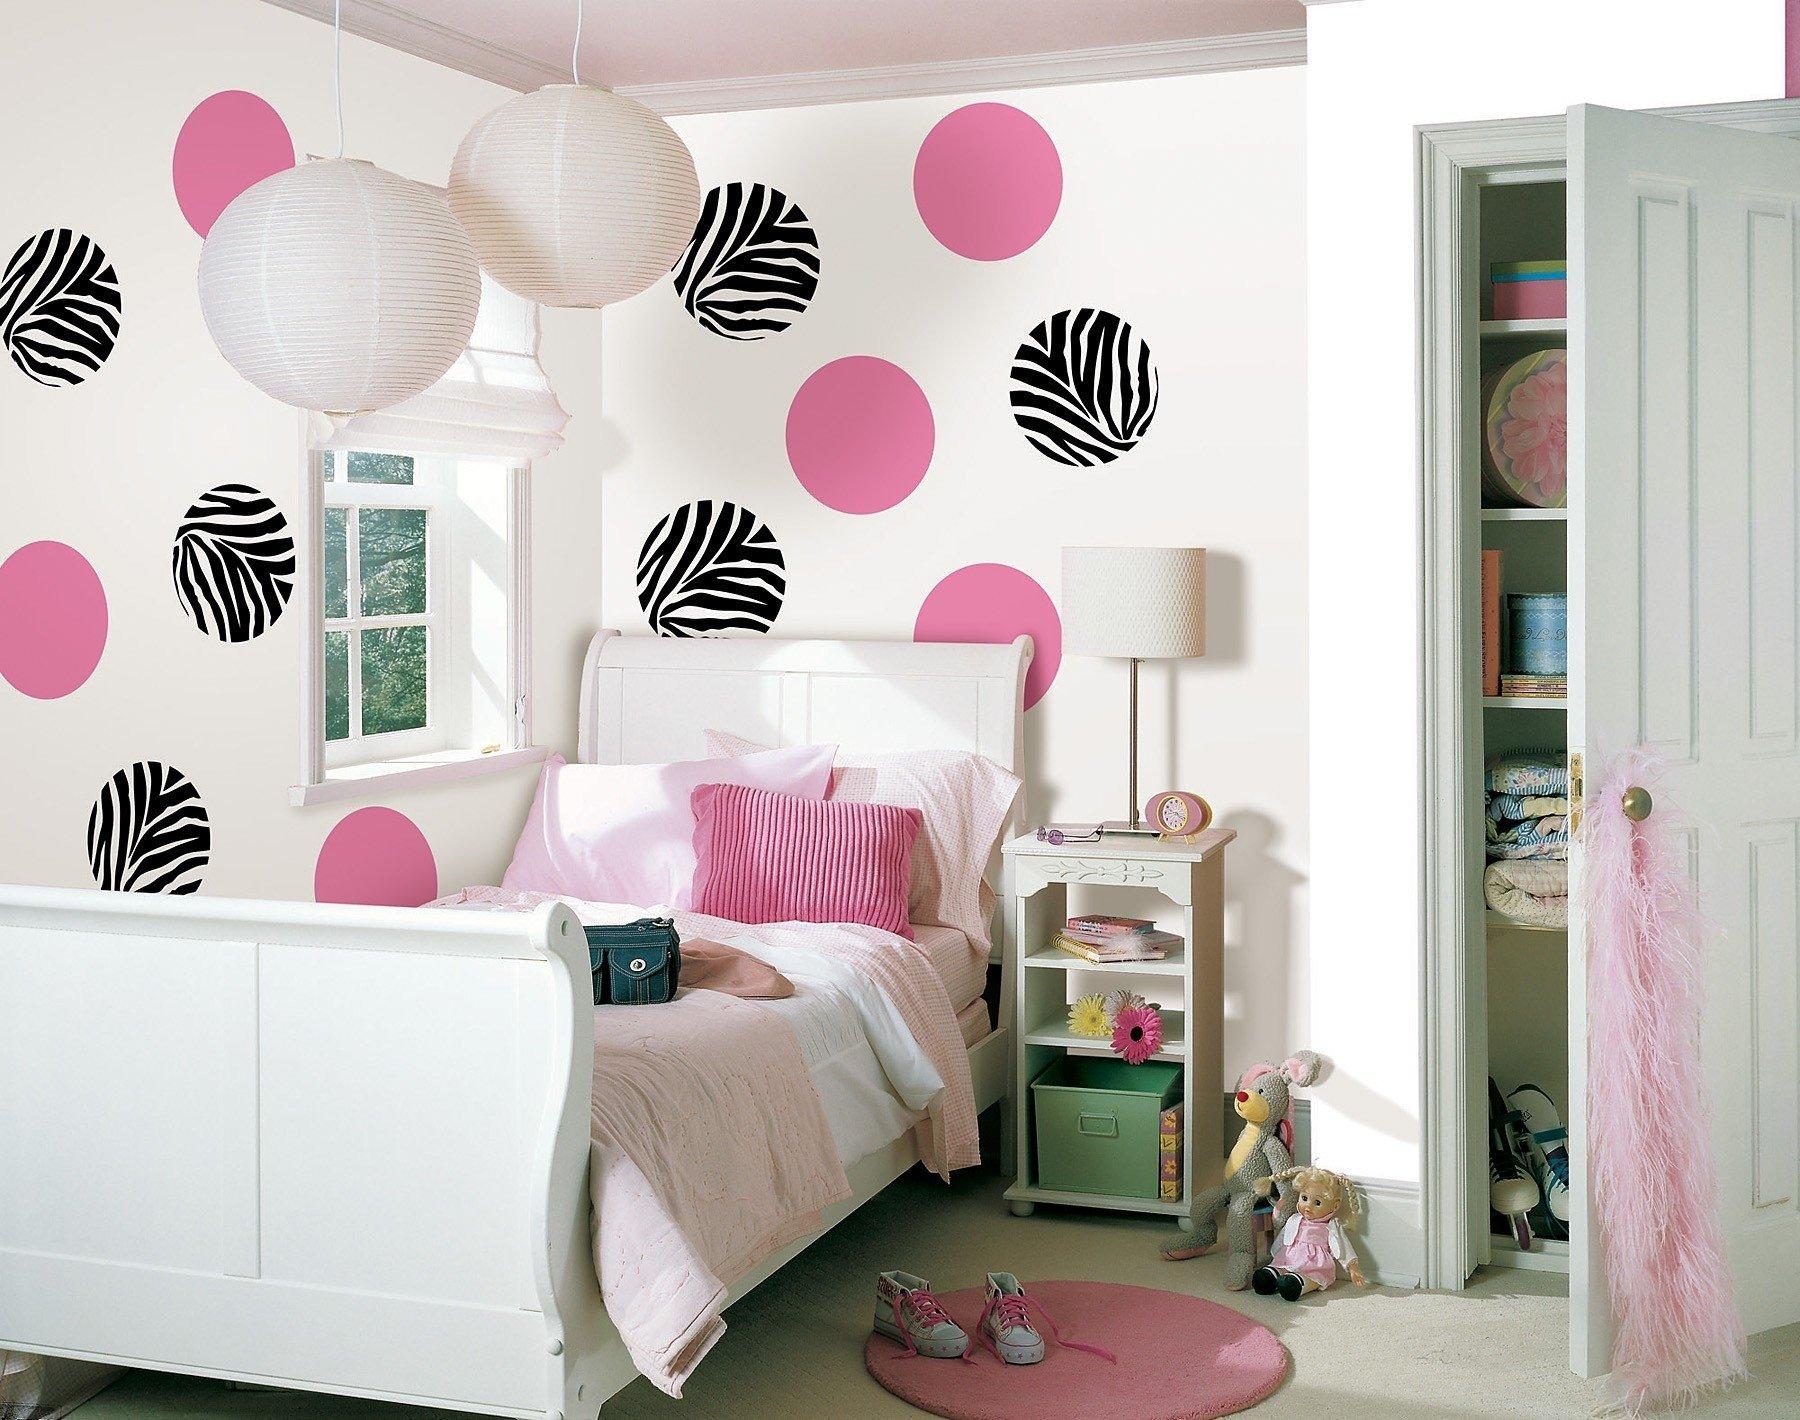 10 Wonderful Painting Ideas For Girls Room bedroom girls bedroom pictures interior design ideas bedroom girls 2020